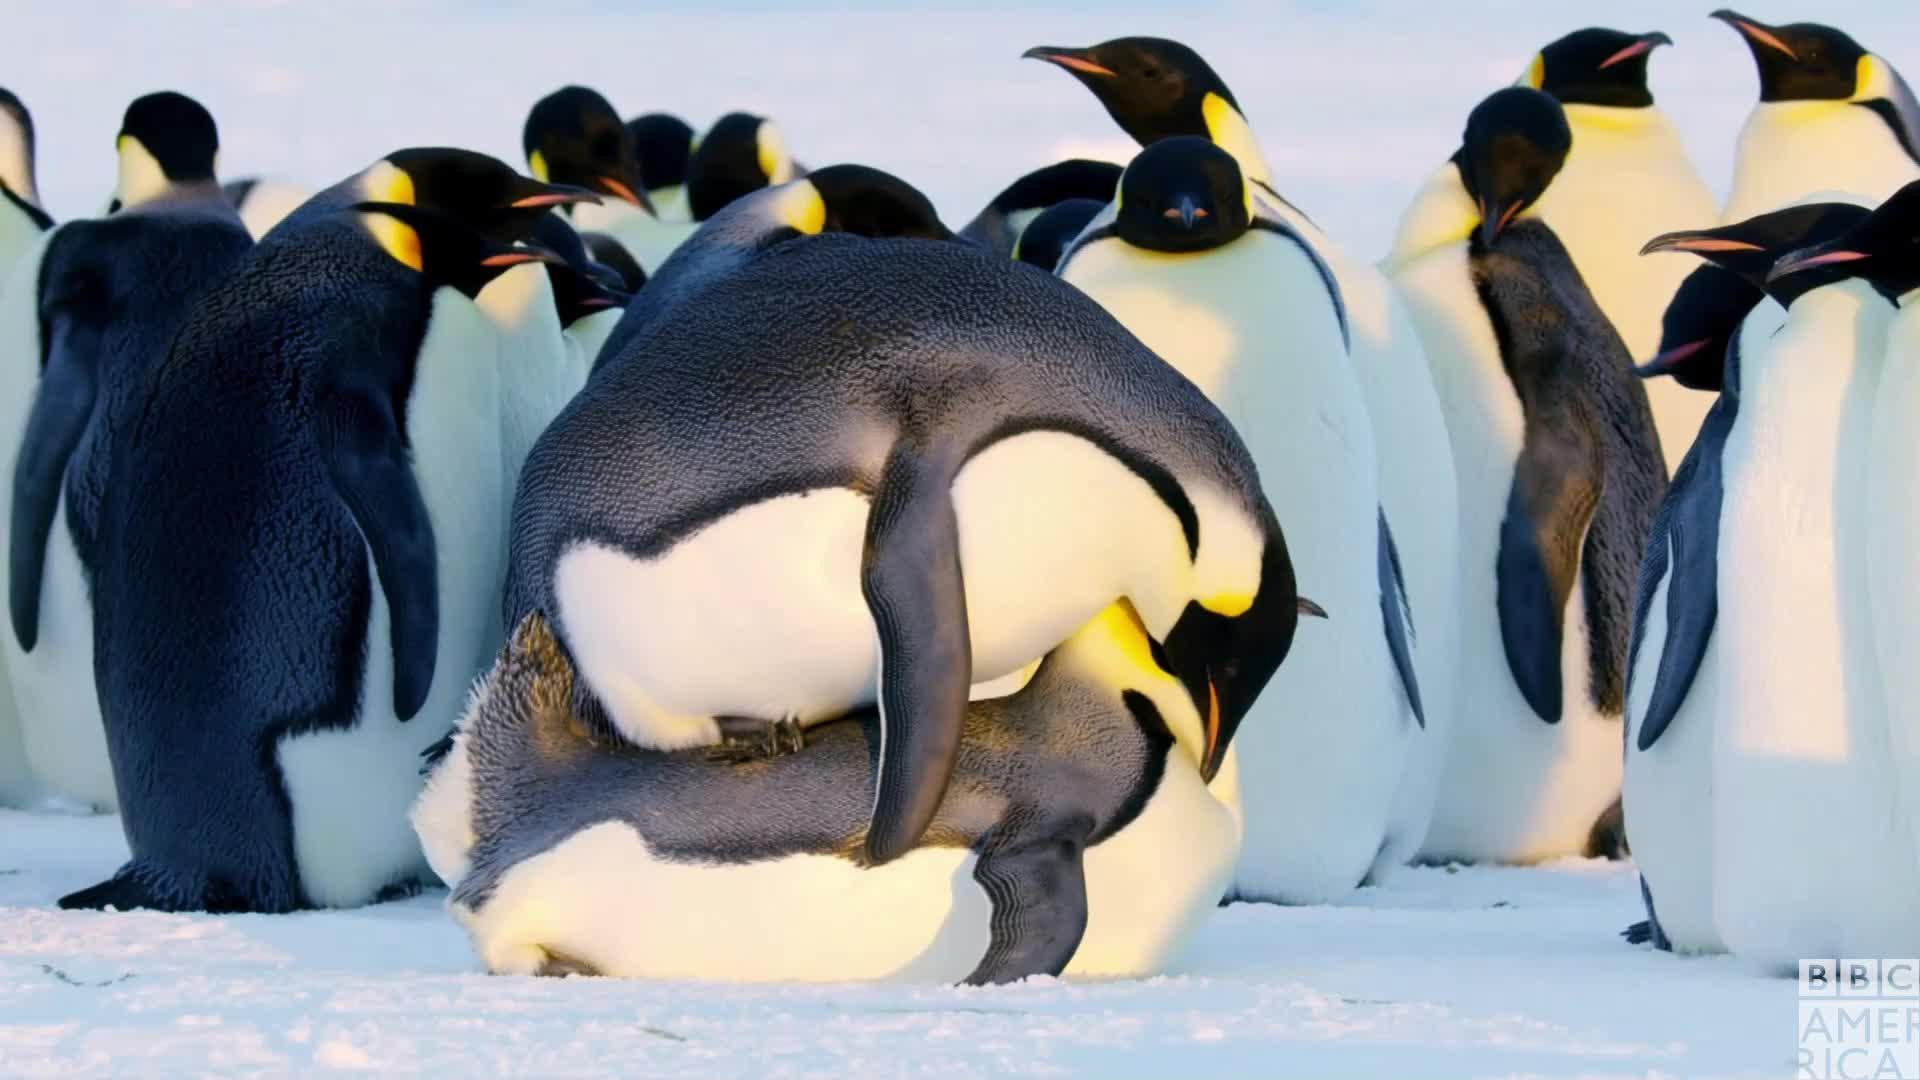 animal, animals, bbc america, bbc america dynasties, bbc america: dynasties, dynasties, emperor penguin, emperor penguins, funny, penguin, penguins, sex, Dynasties Penguin Sex GIFs